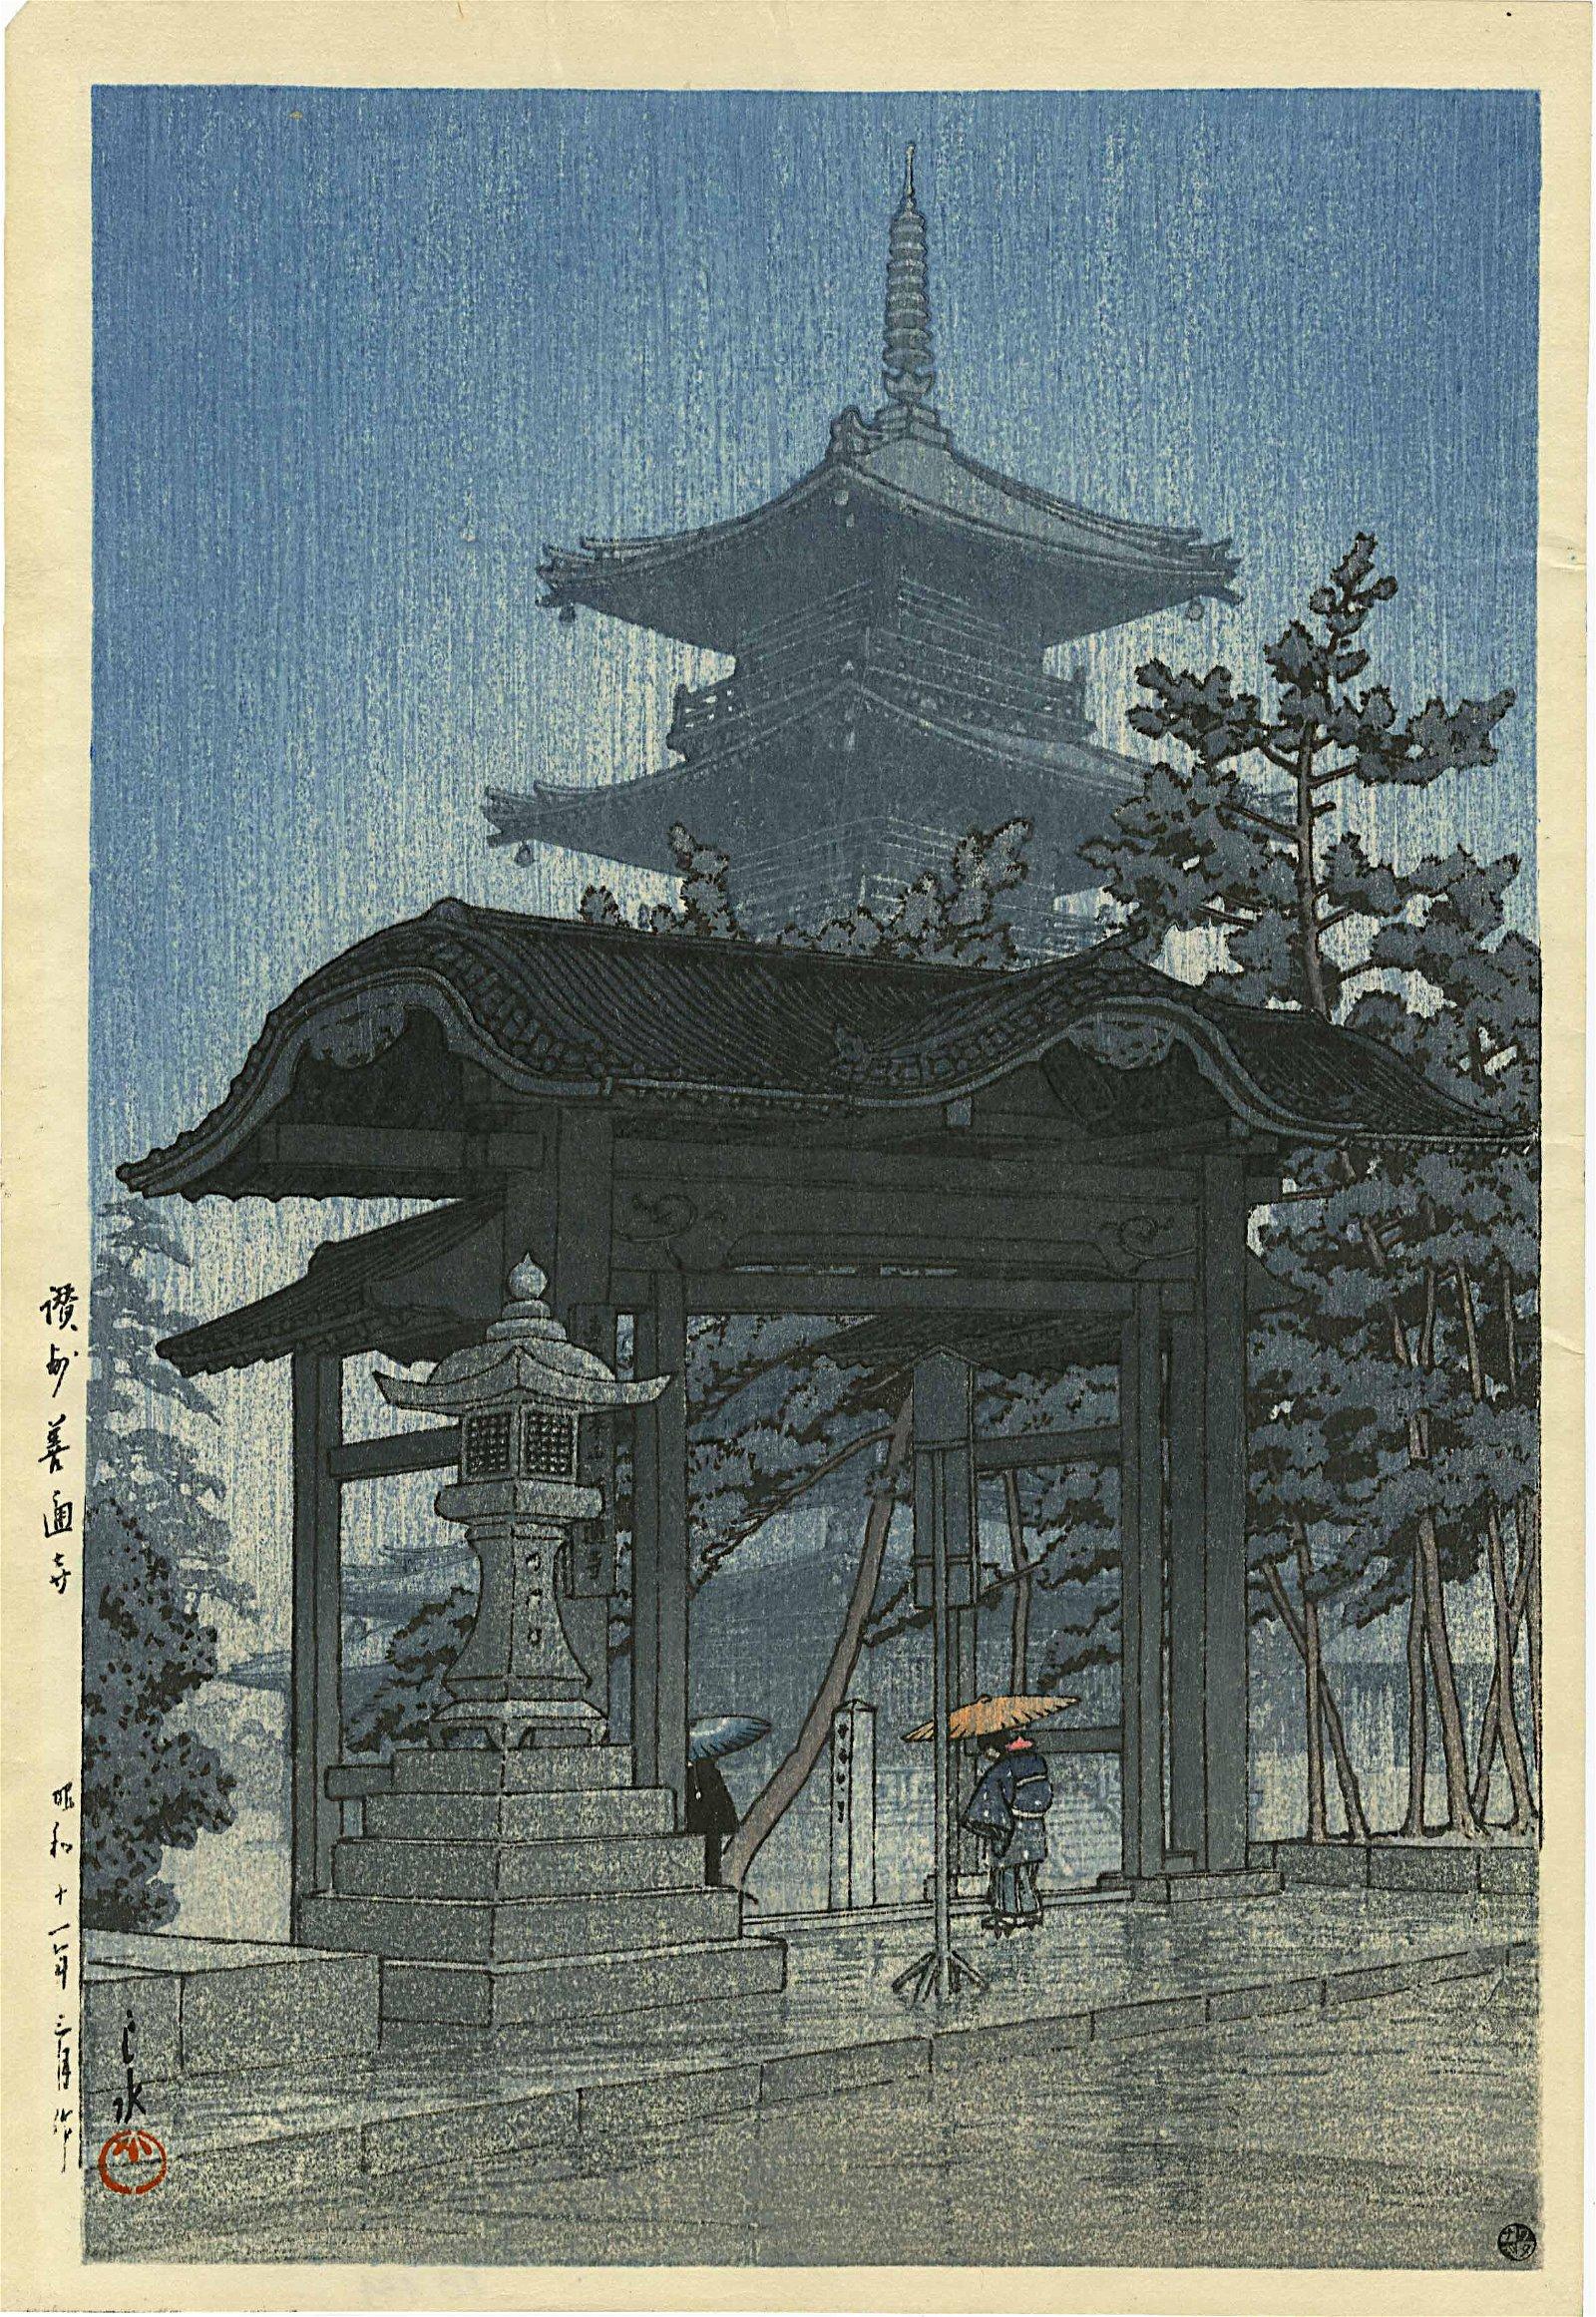 Hasui Kawase: Zentsuji Temple Rain 1937 Woodblock